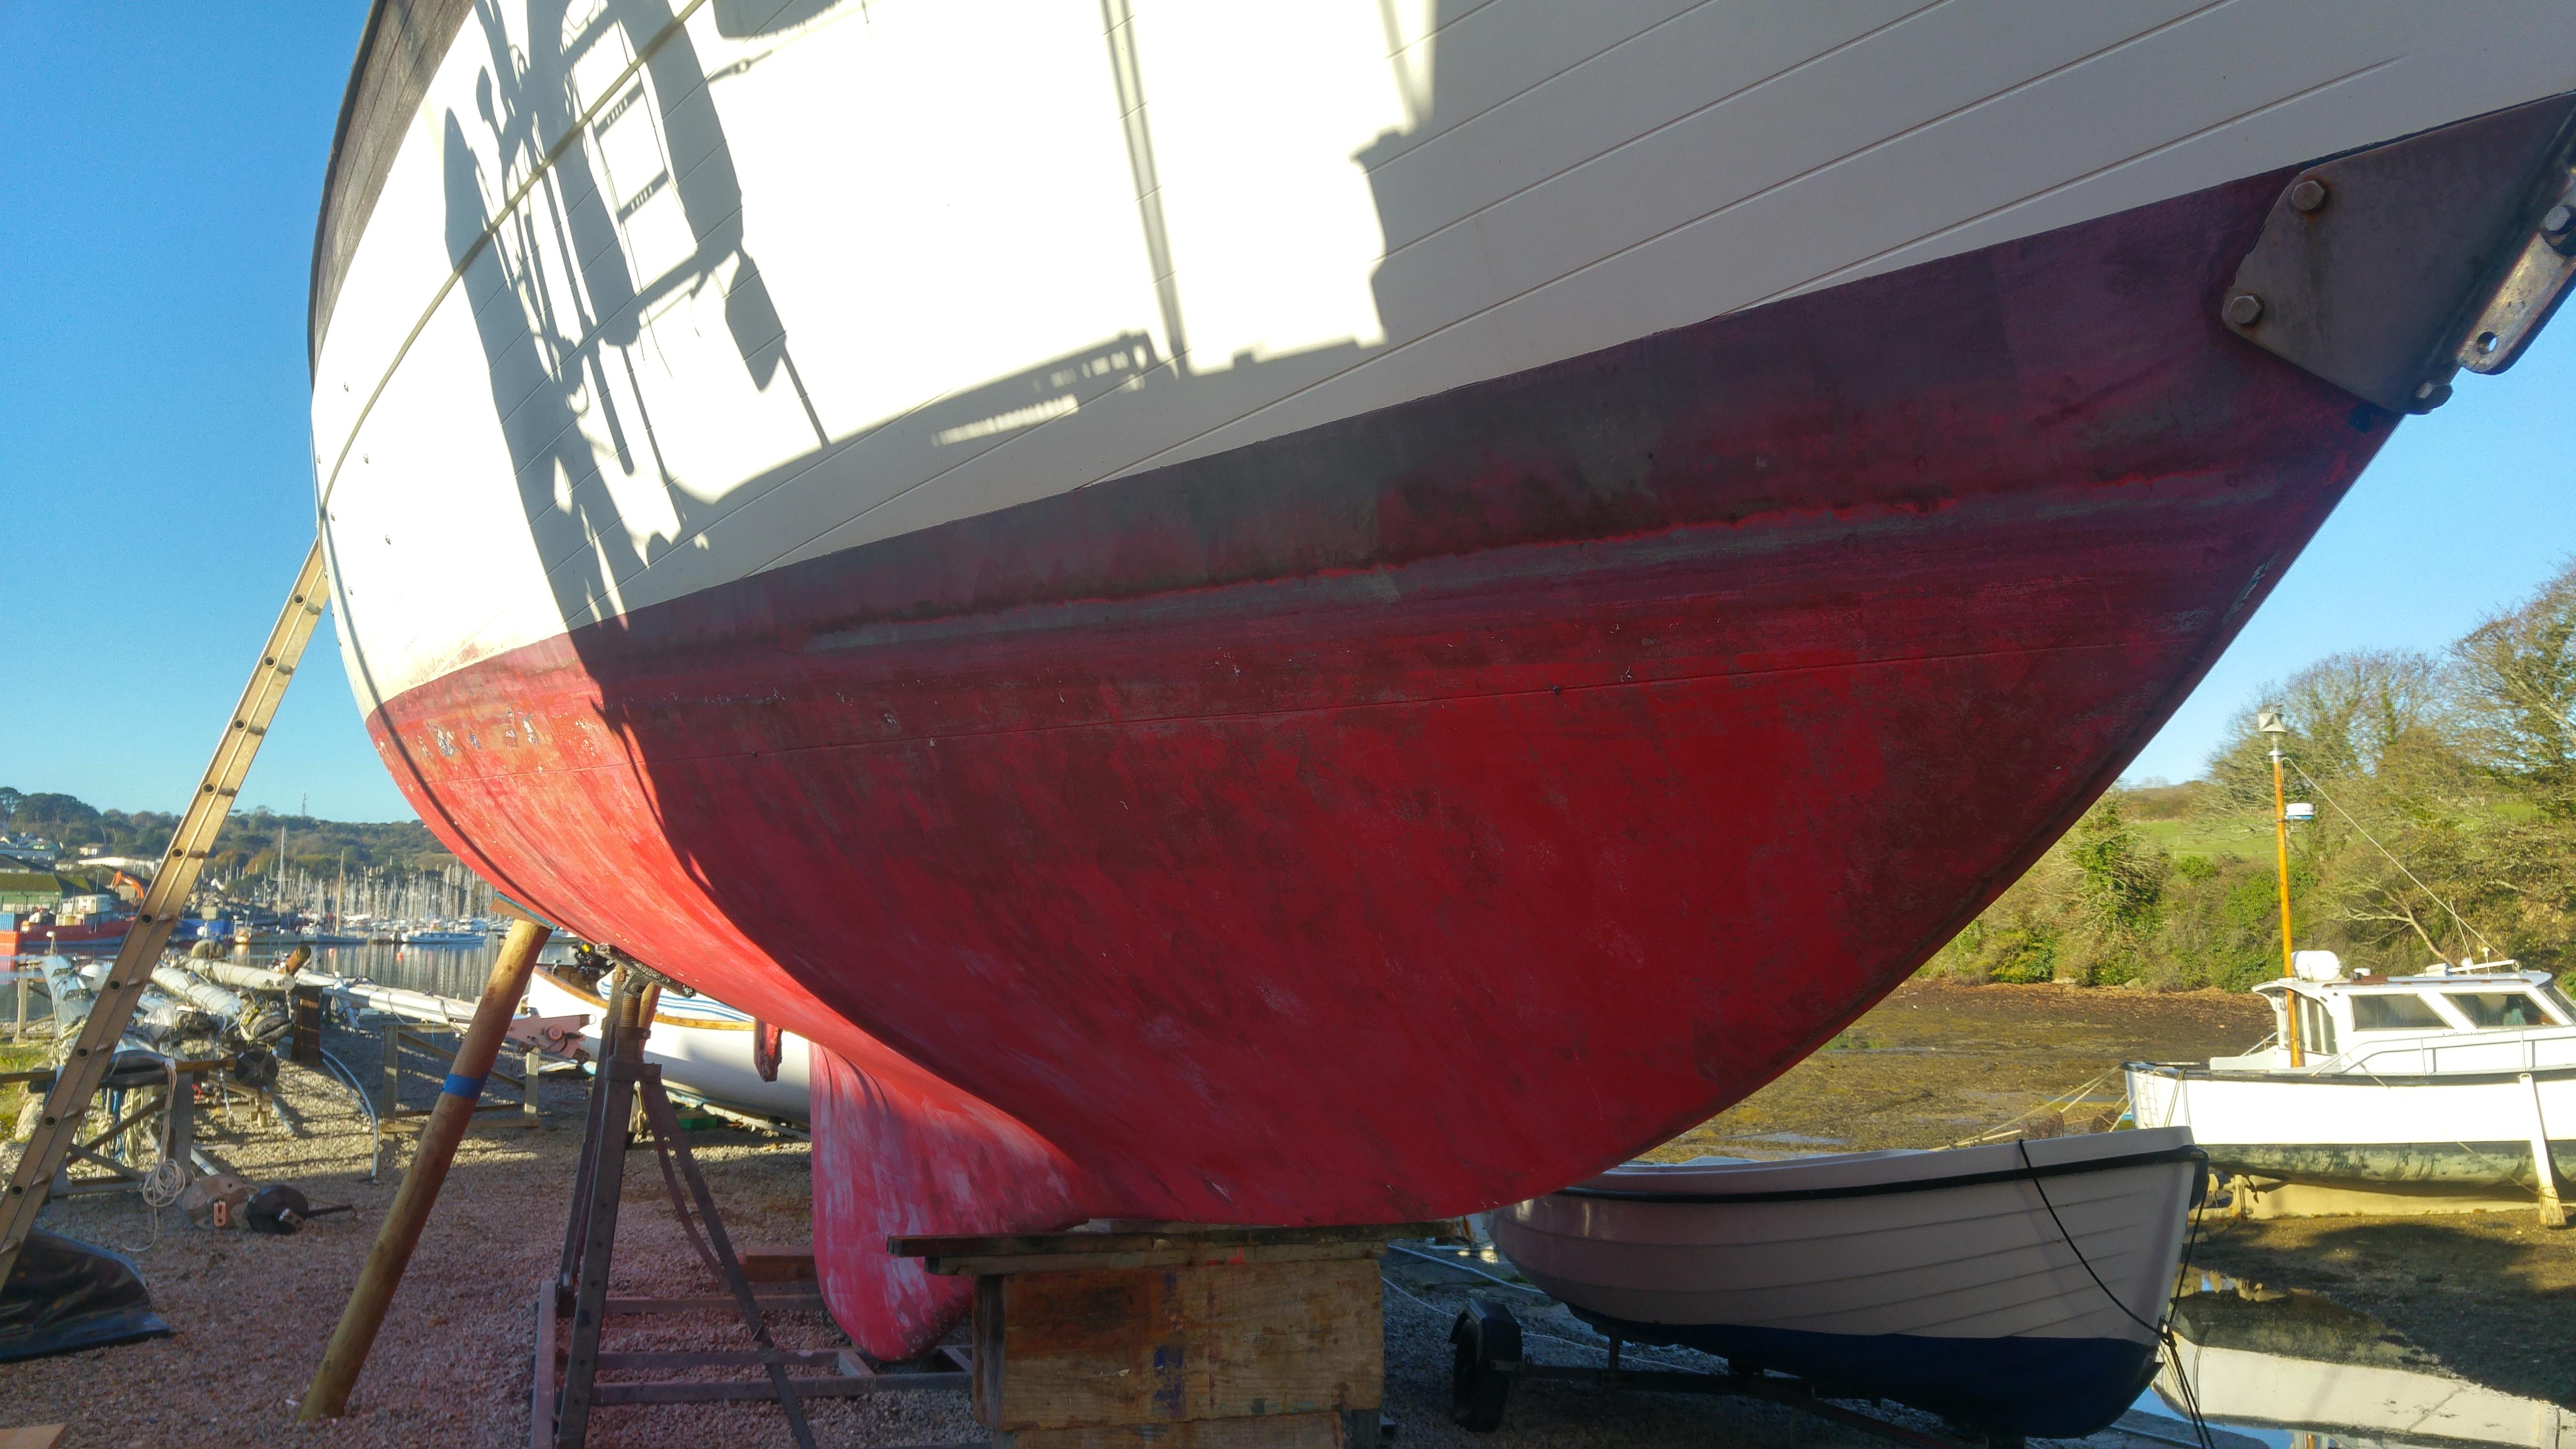 Yacht on shore